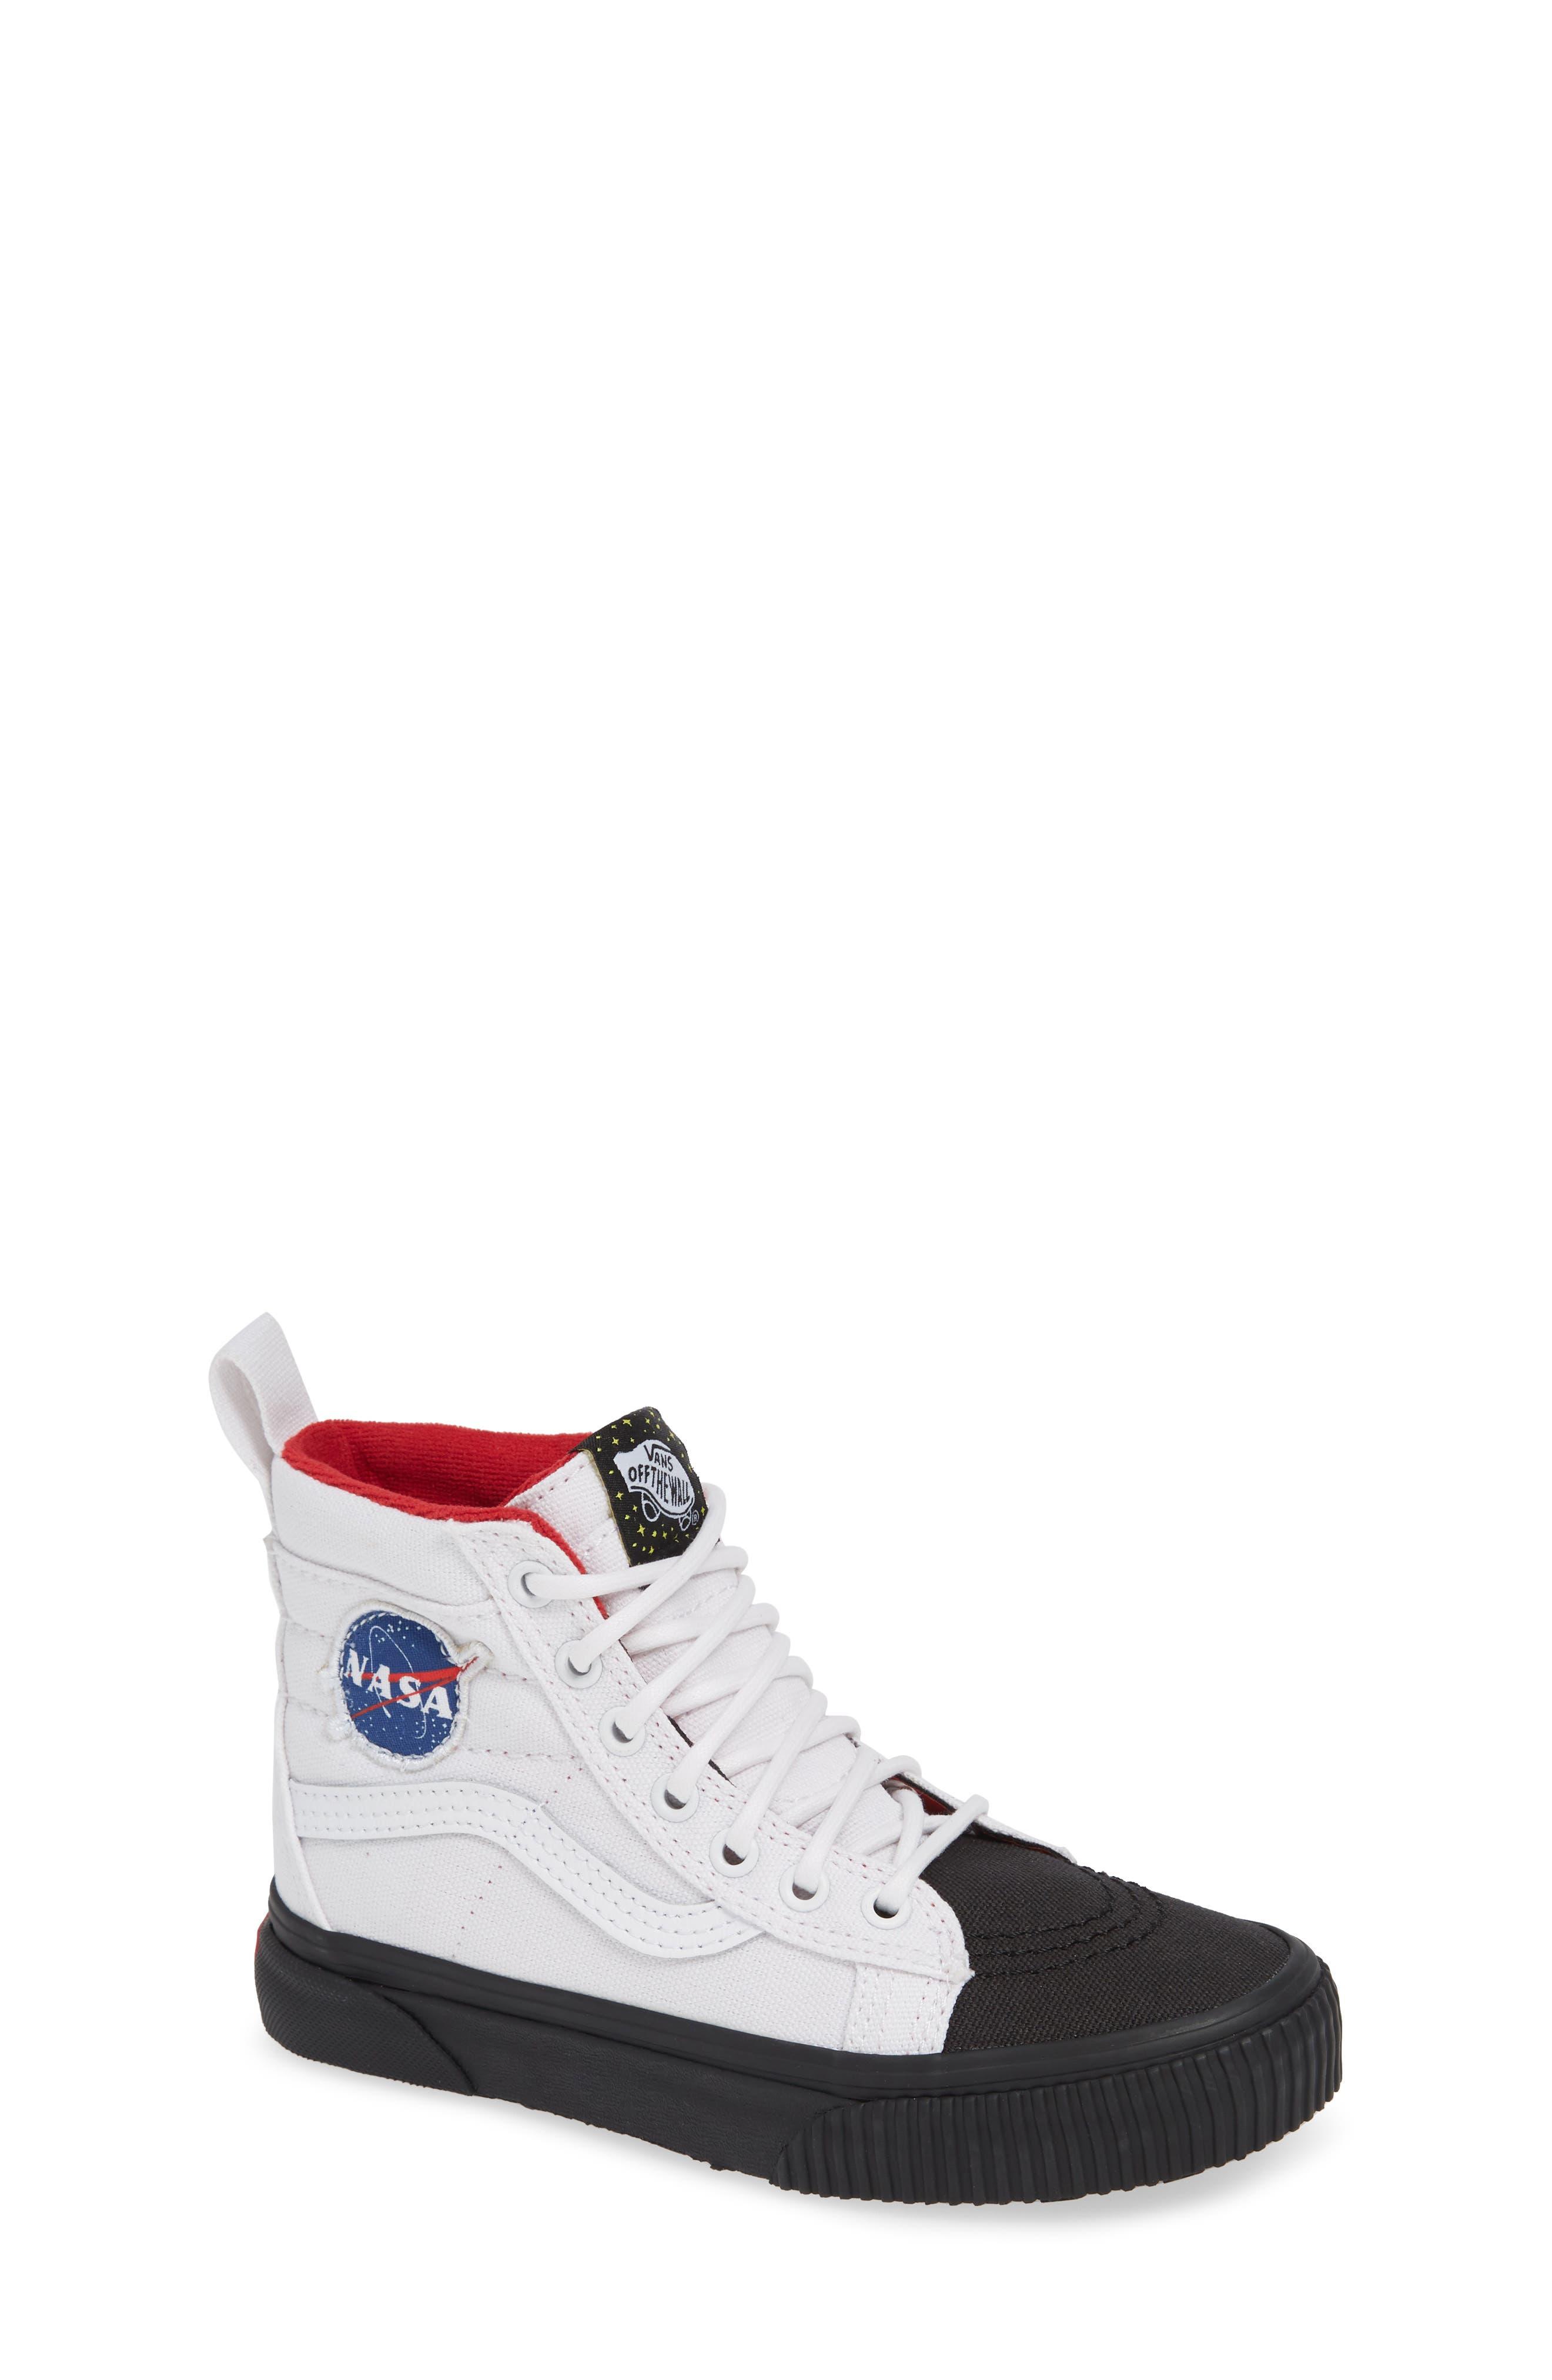 baby vans pram shoes